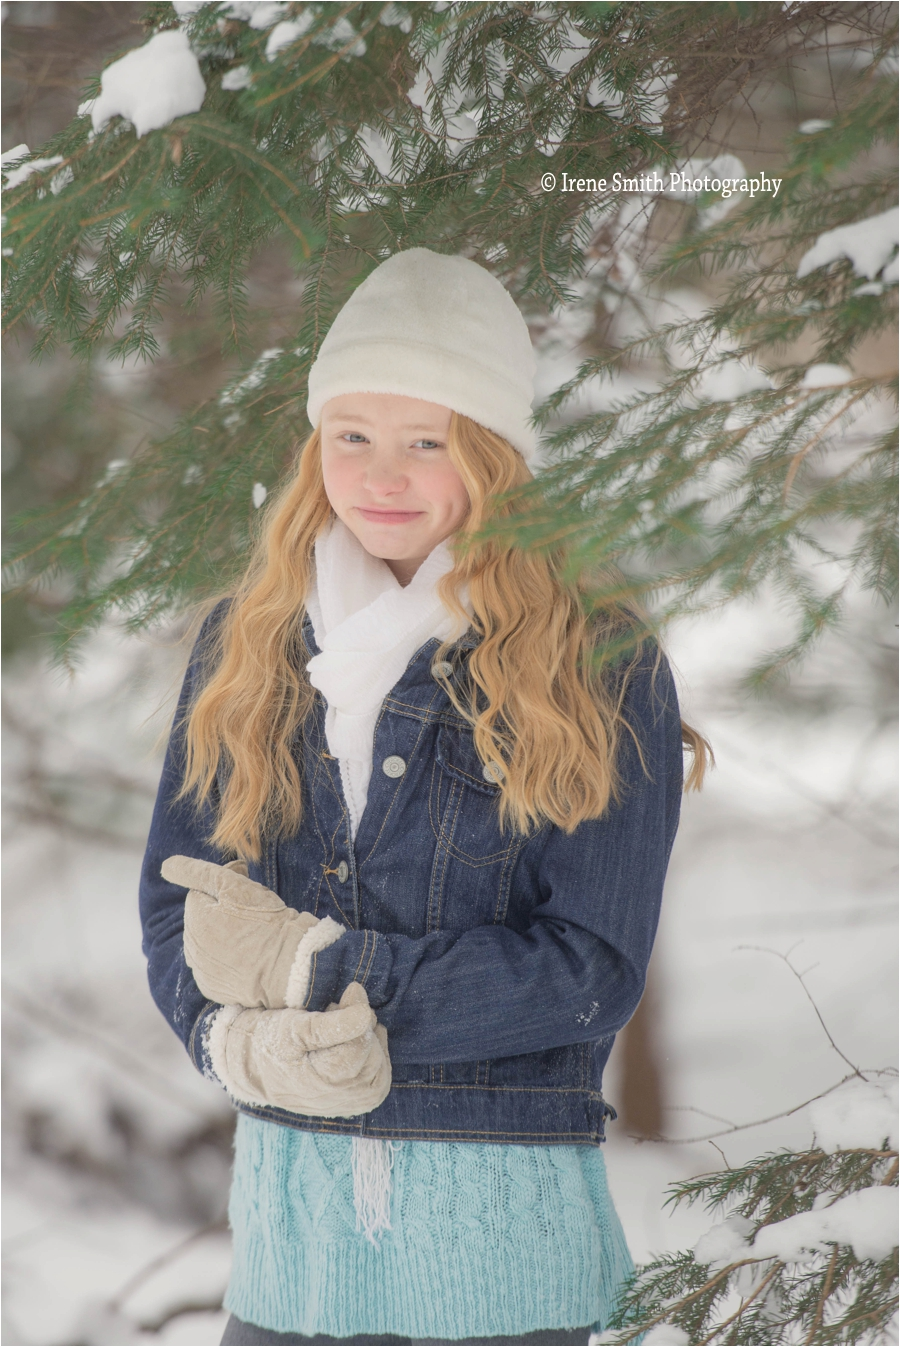 Irene-Smith-Photography-Franklin-Oil-City-Pennsylvania_0045